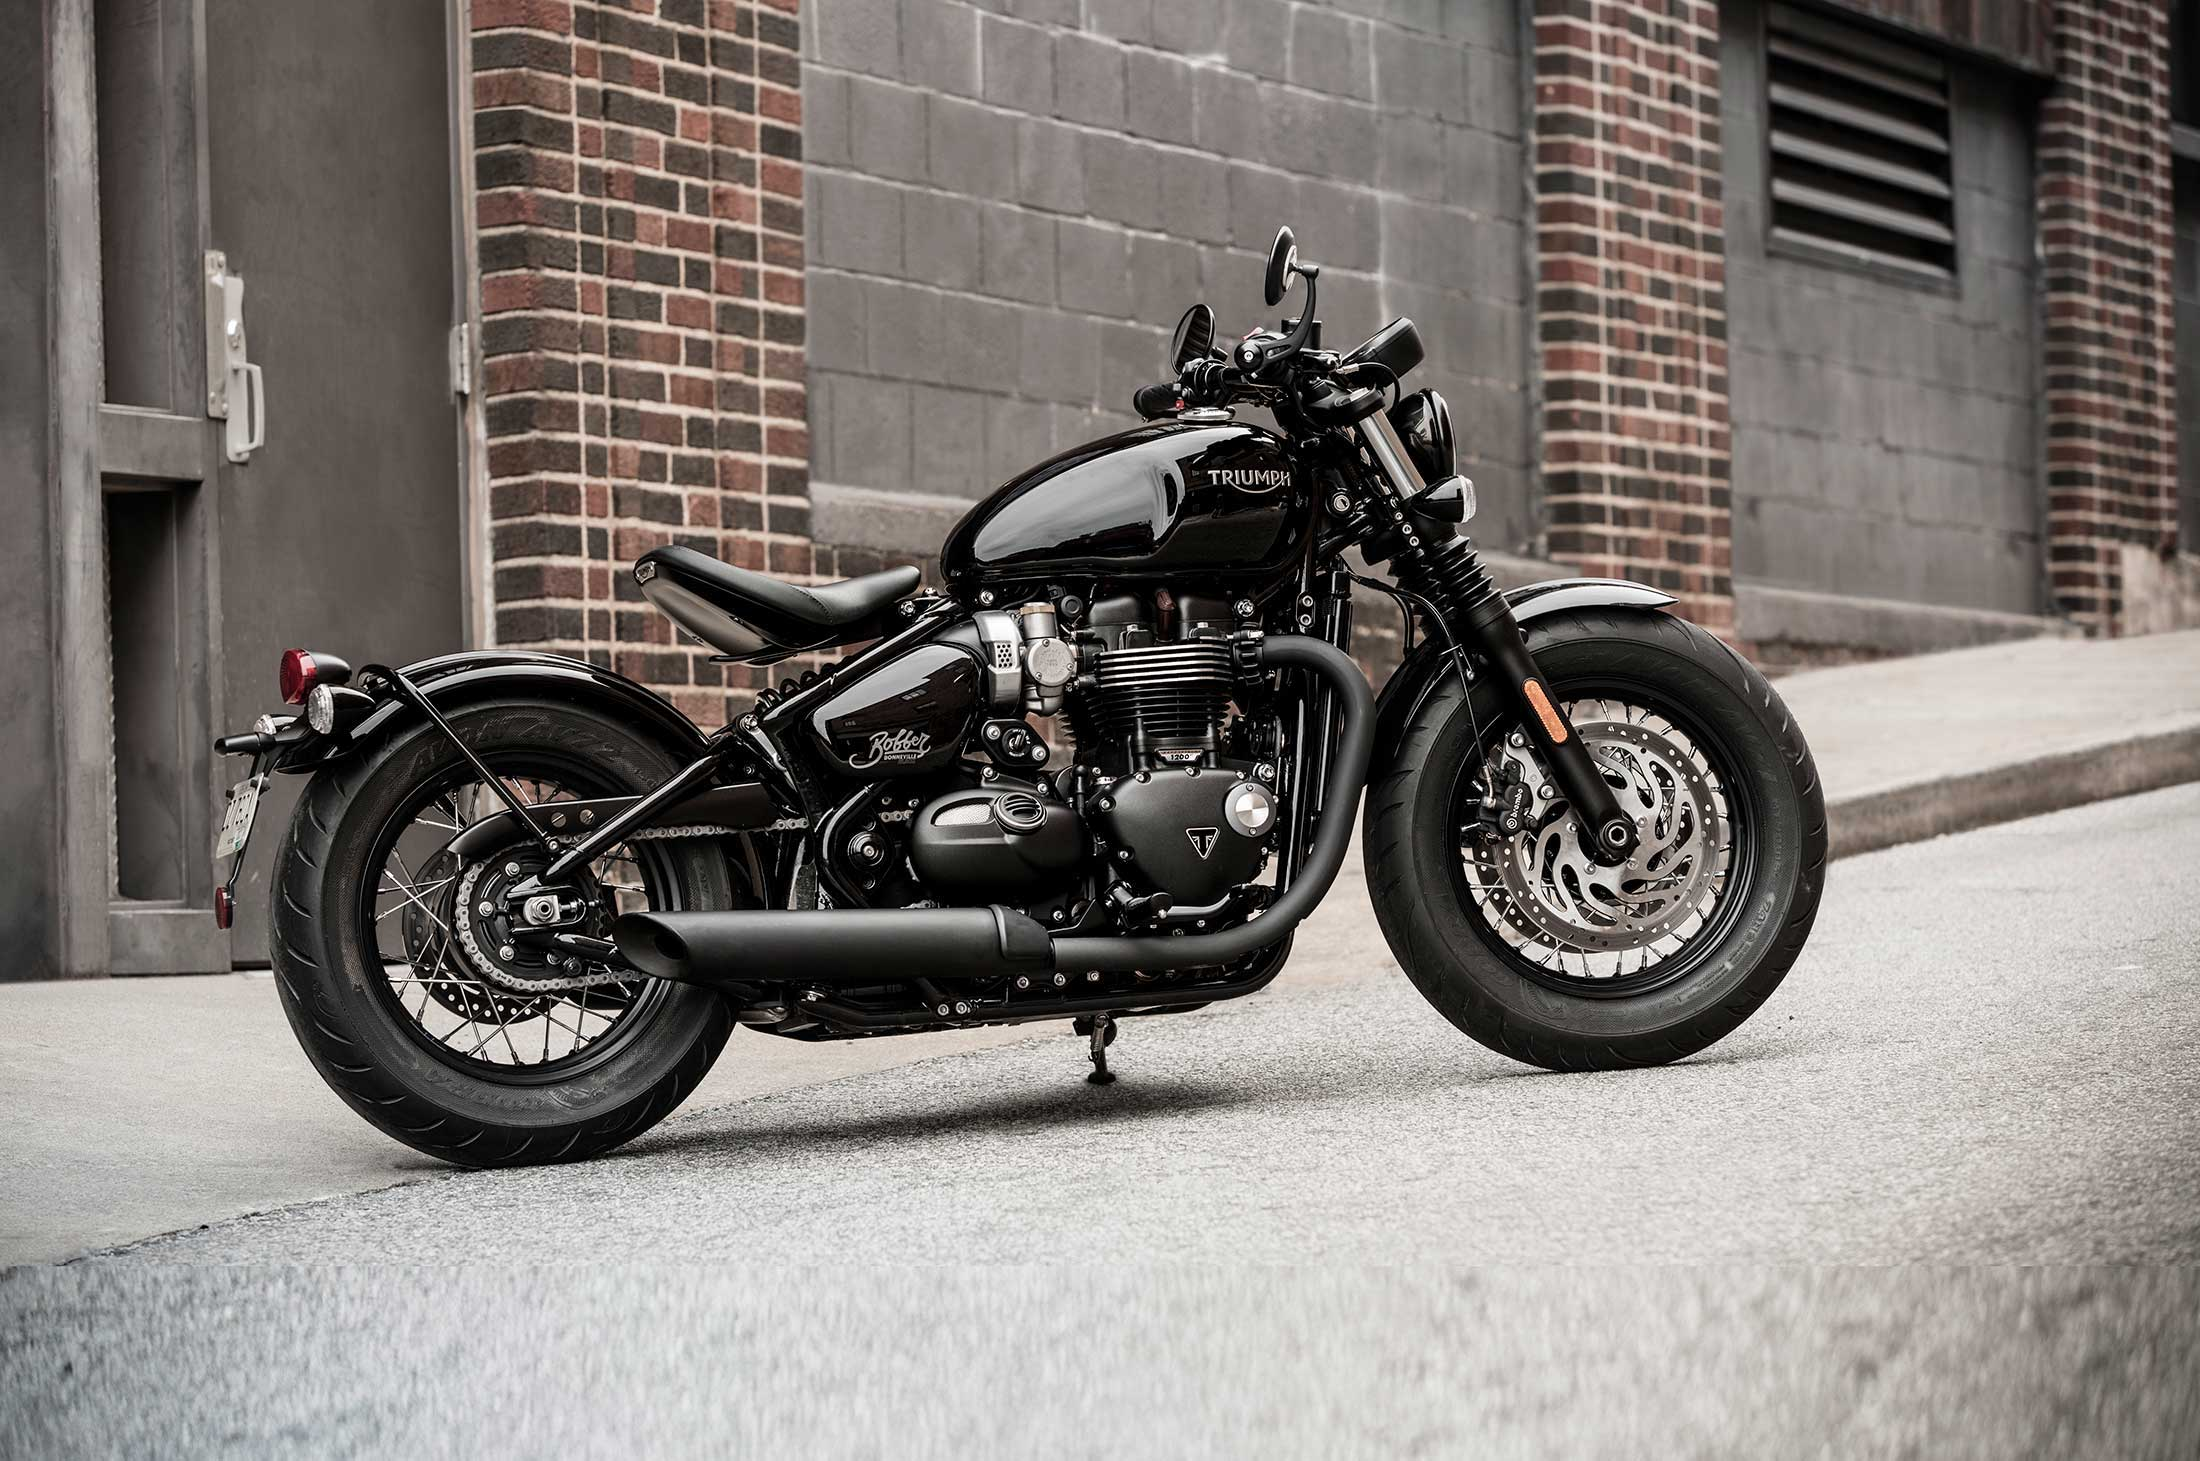 xe moto moi - elle man 5